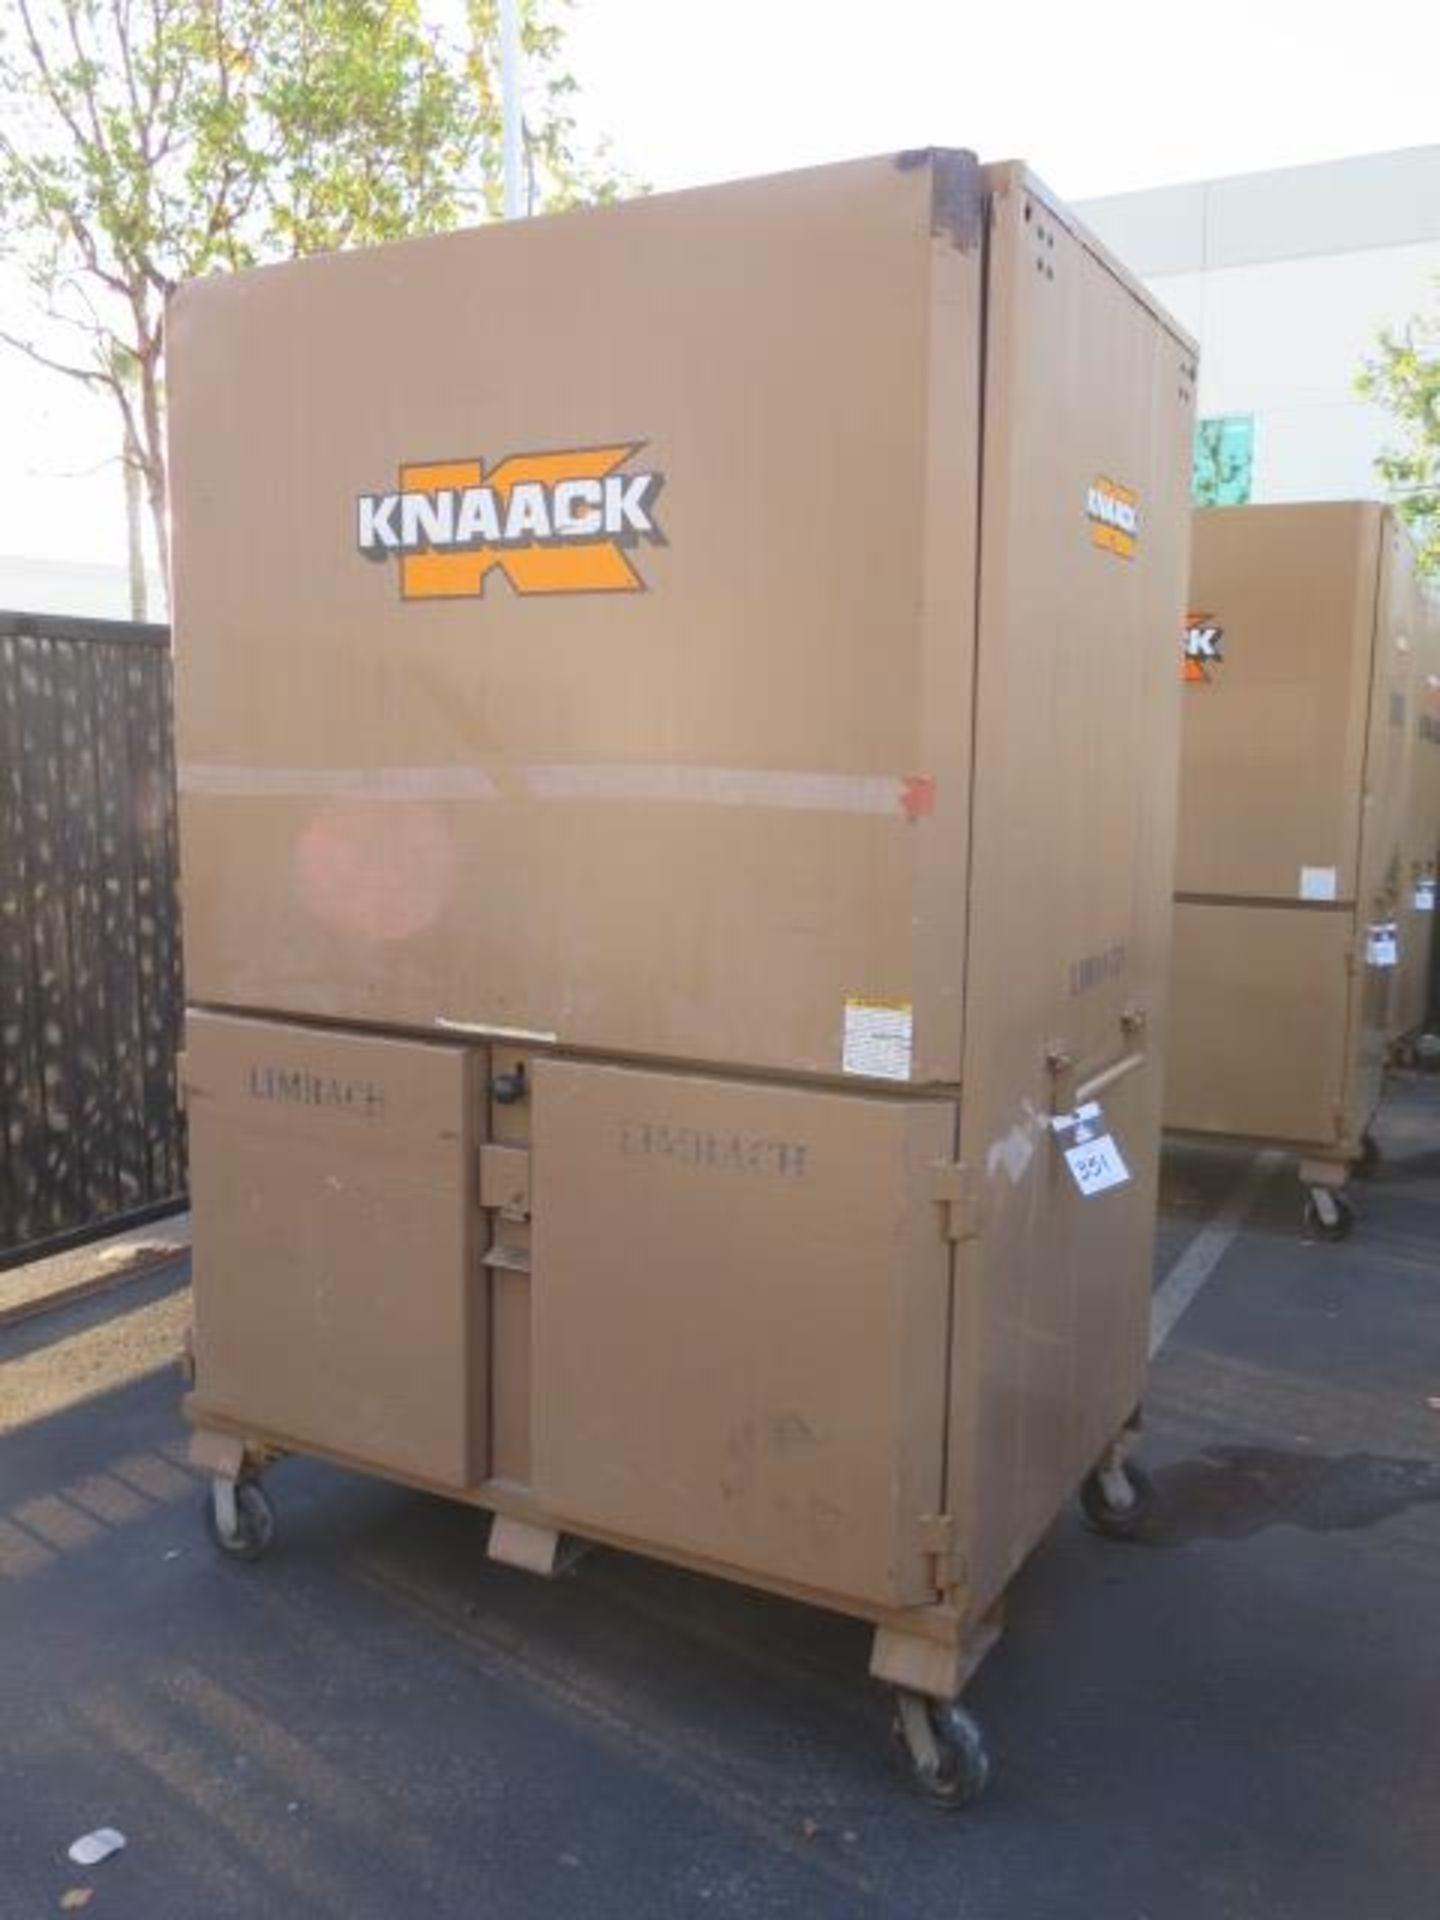 Knaack mdl. 119-01 Rolling Job Box (SOLD AS-IS - NO WARRANTY) - Image 2 of 7